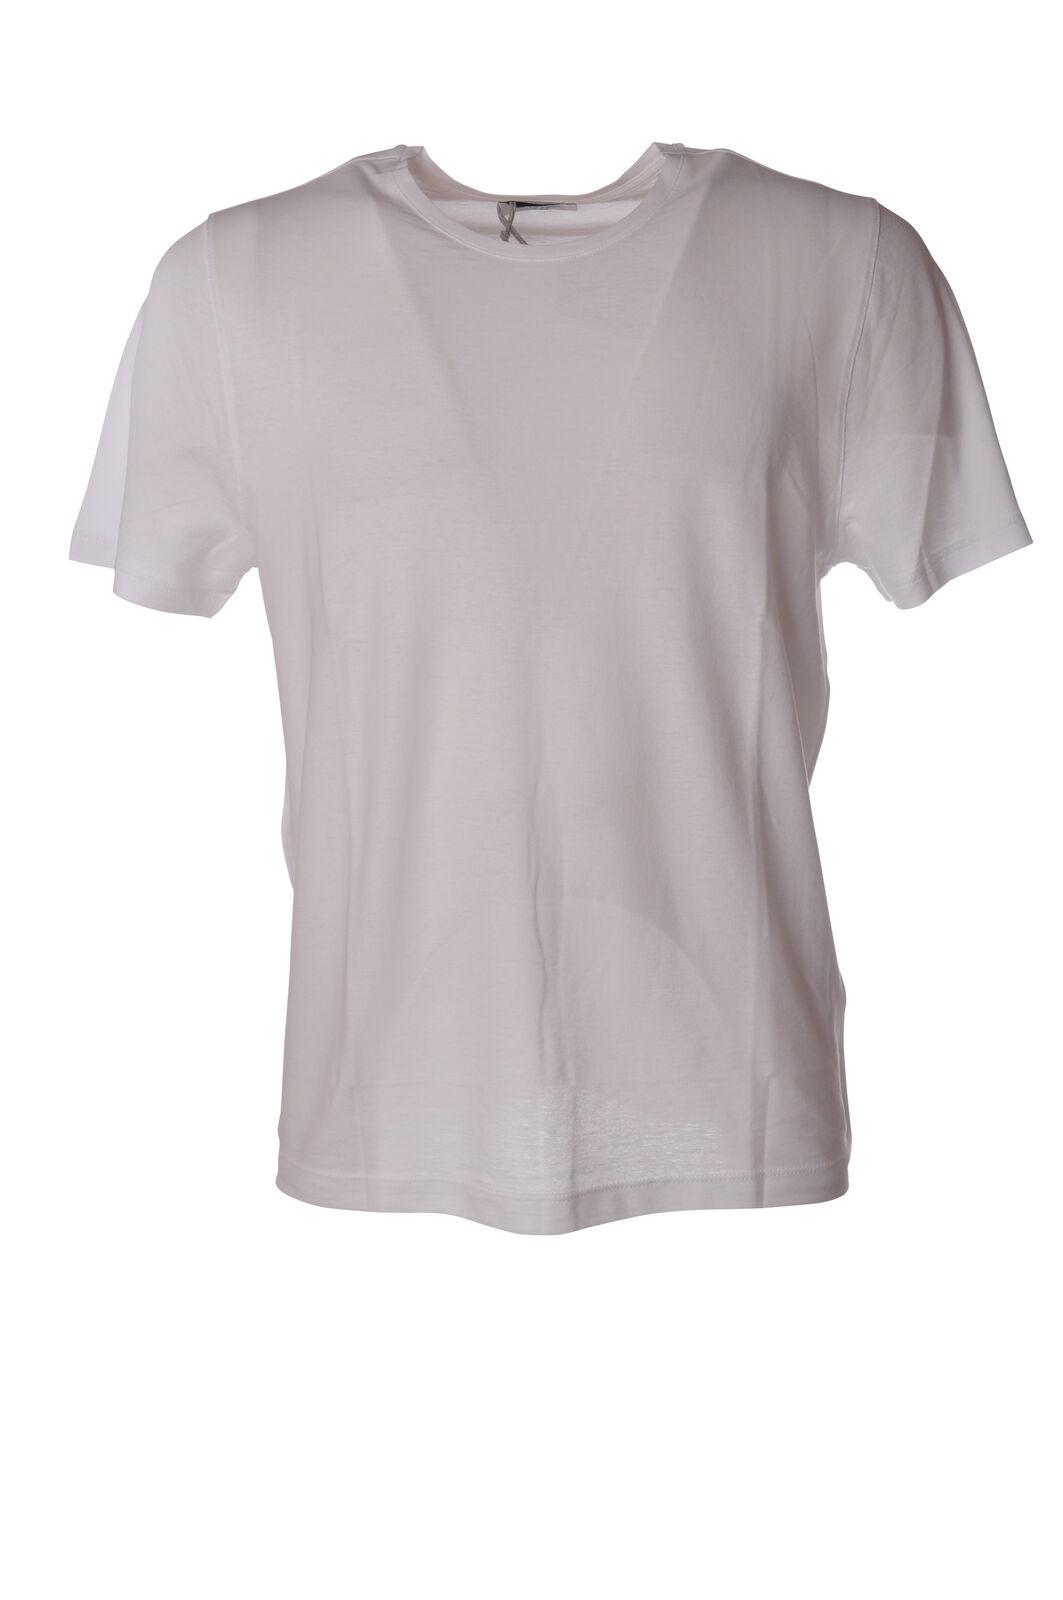 Heritage - Topwear-T-shirts - Man - White - 5221716D180741